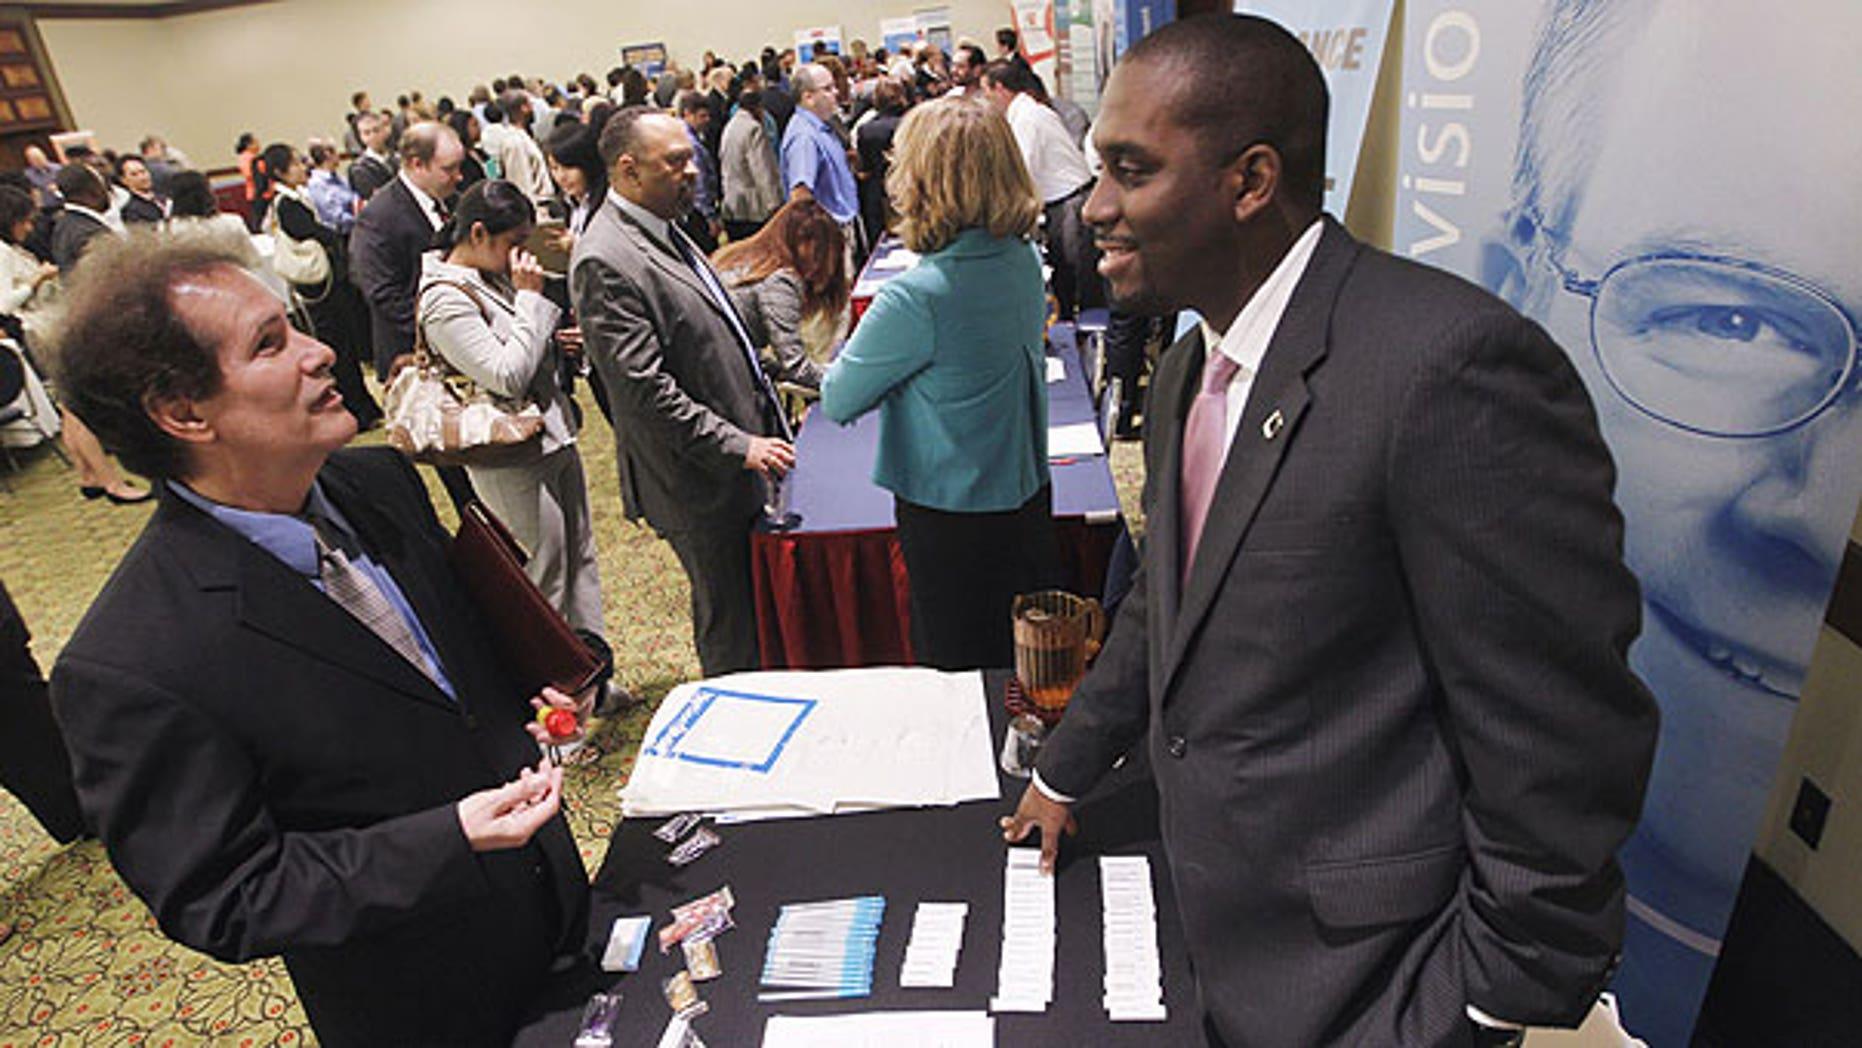 Aug. 4: Recruiter Jason Bryant, right, speaks with job seeker Brian Shumate at the Career Job Fair in Arlington, Va.